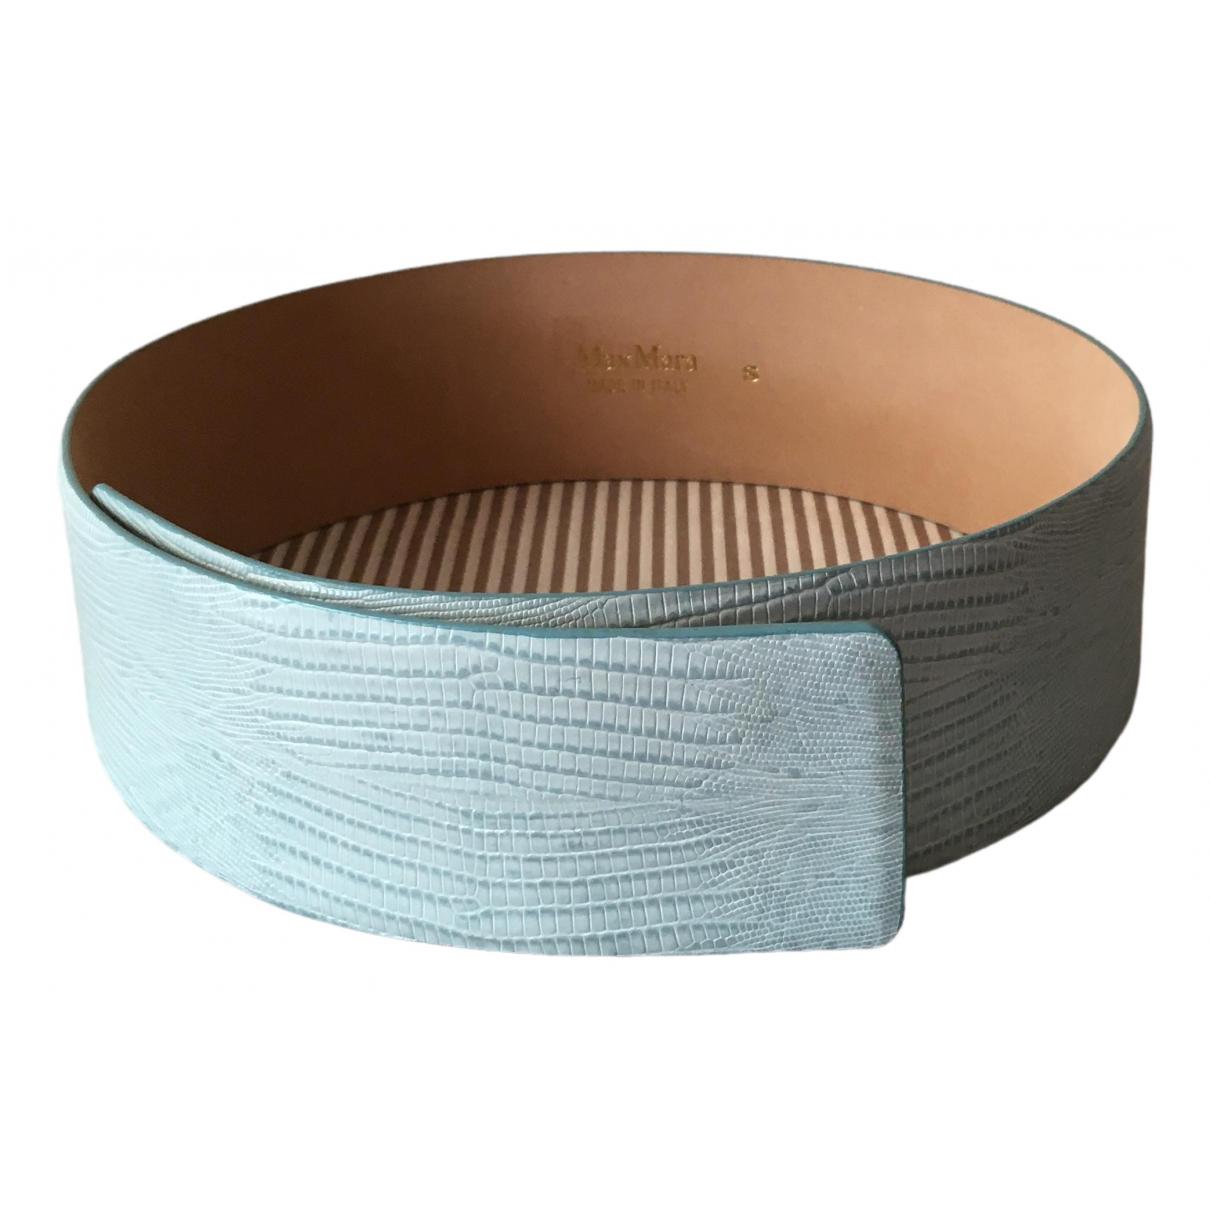 Max Mara \N Blue Leather belt for Women S International